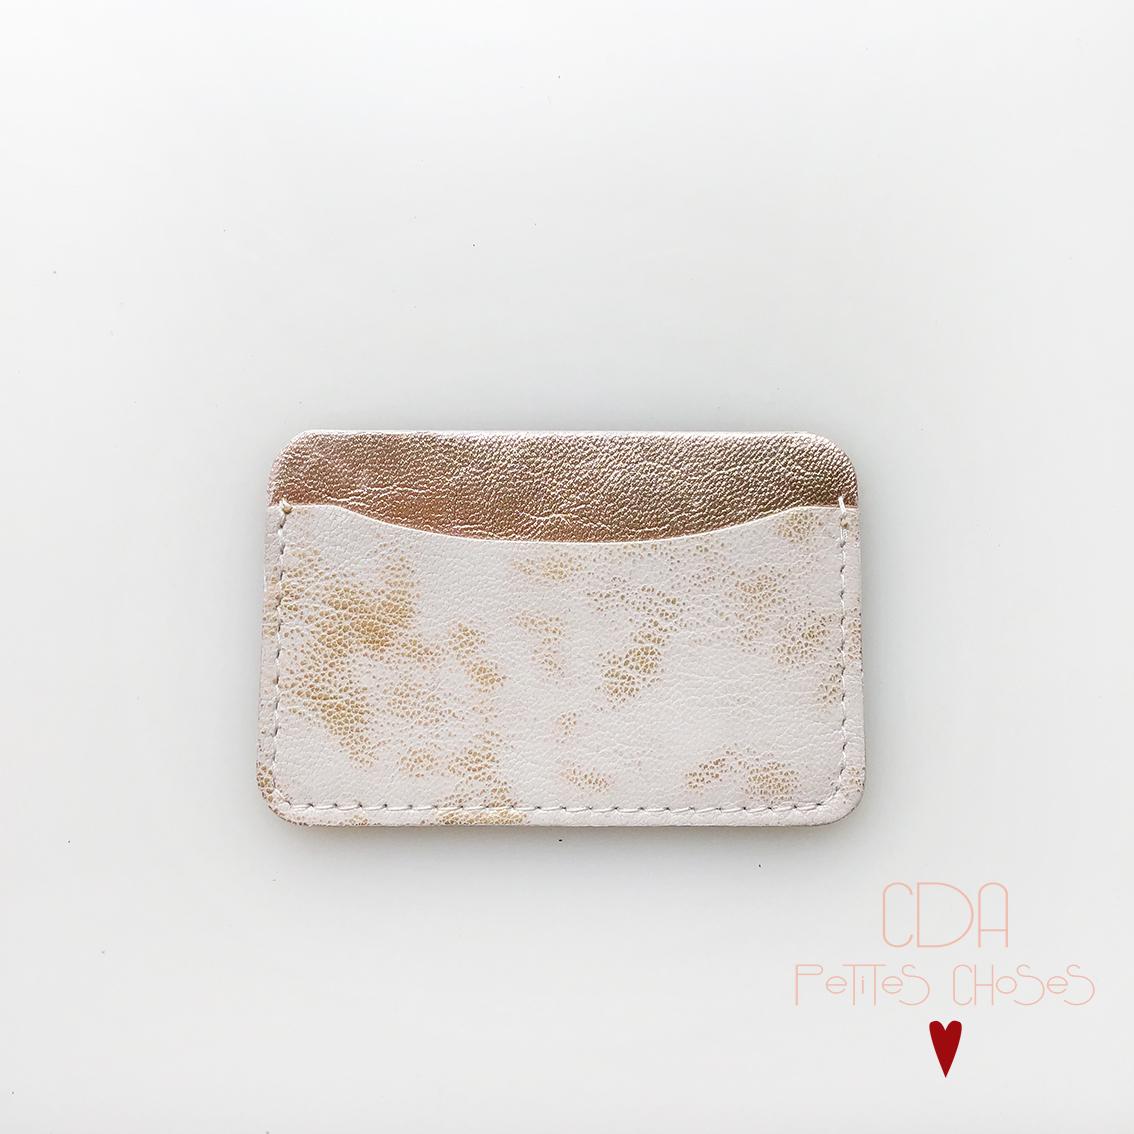 porte-carte-simple-en-cuir-blanc-et-or-2 CDA Petites Choses